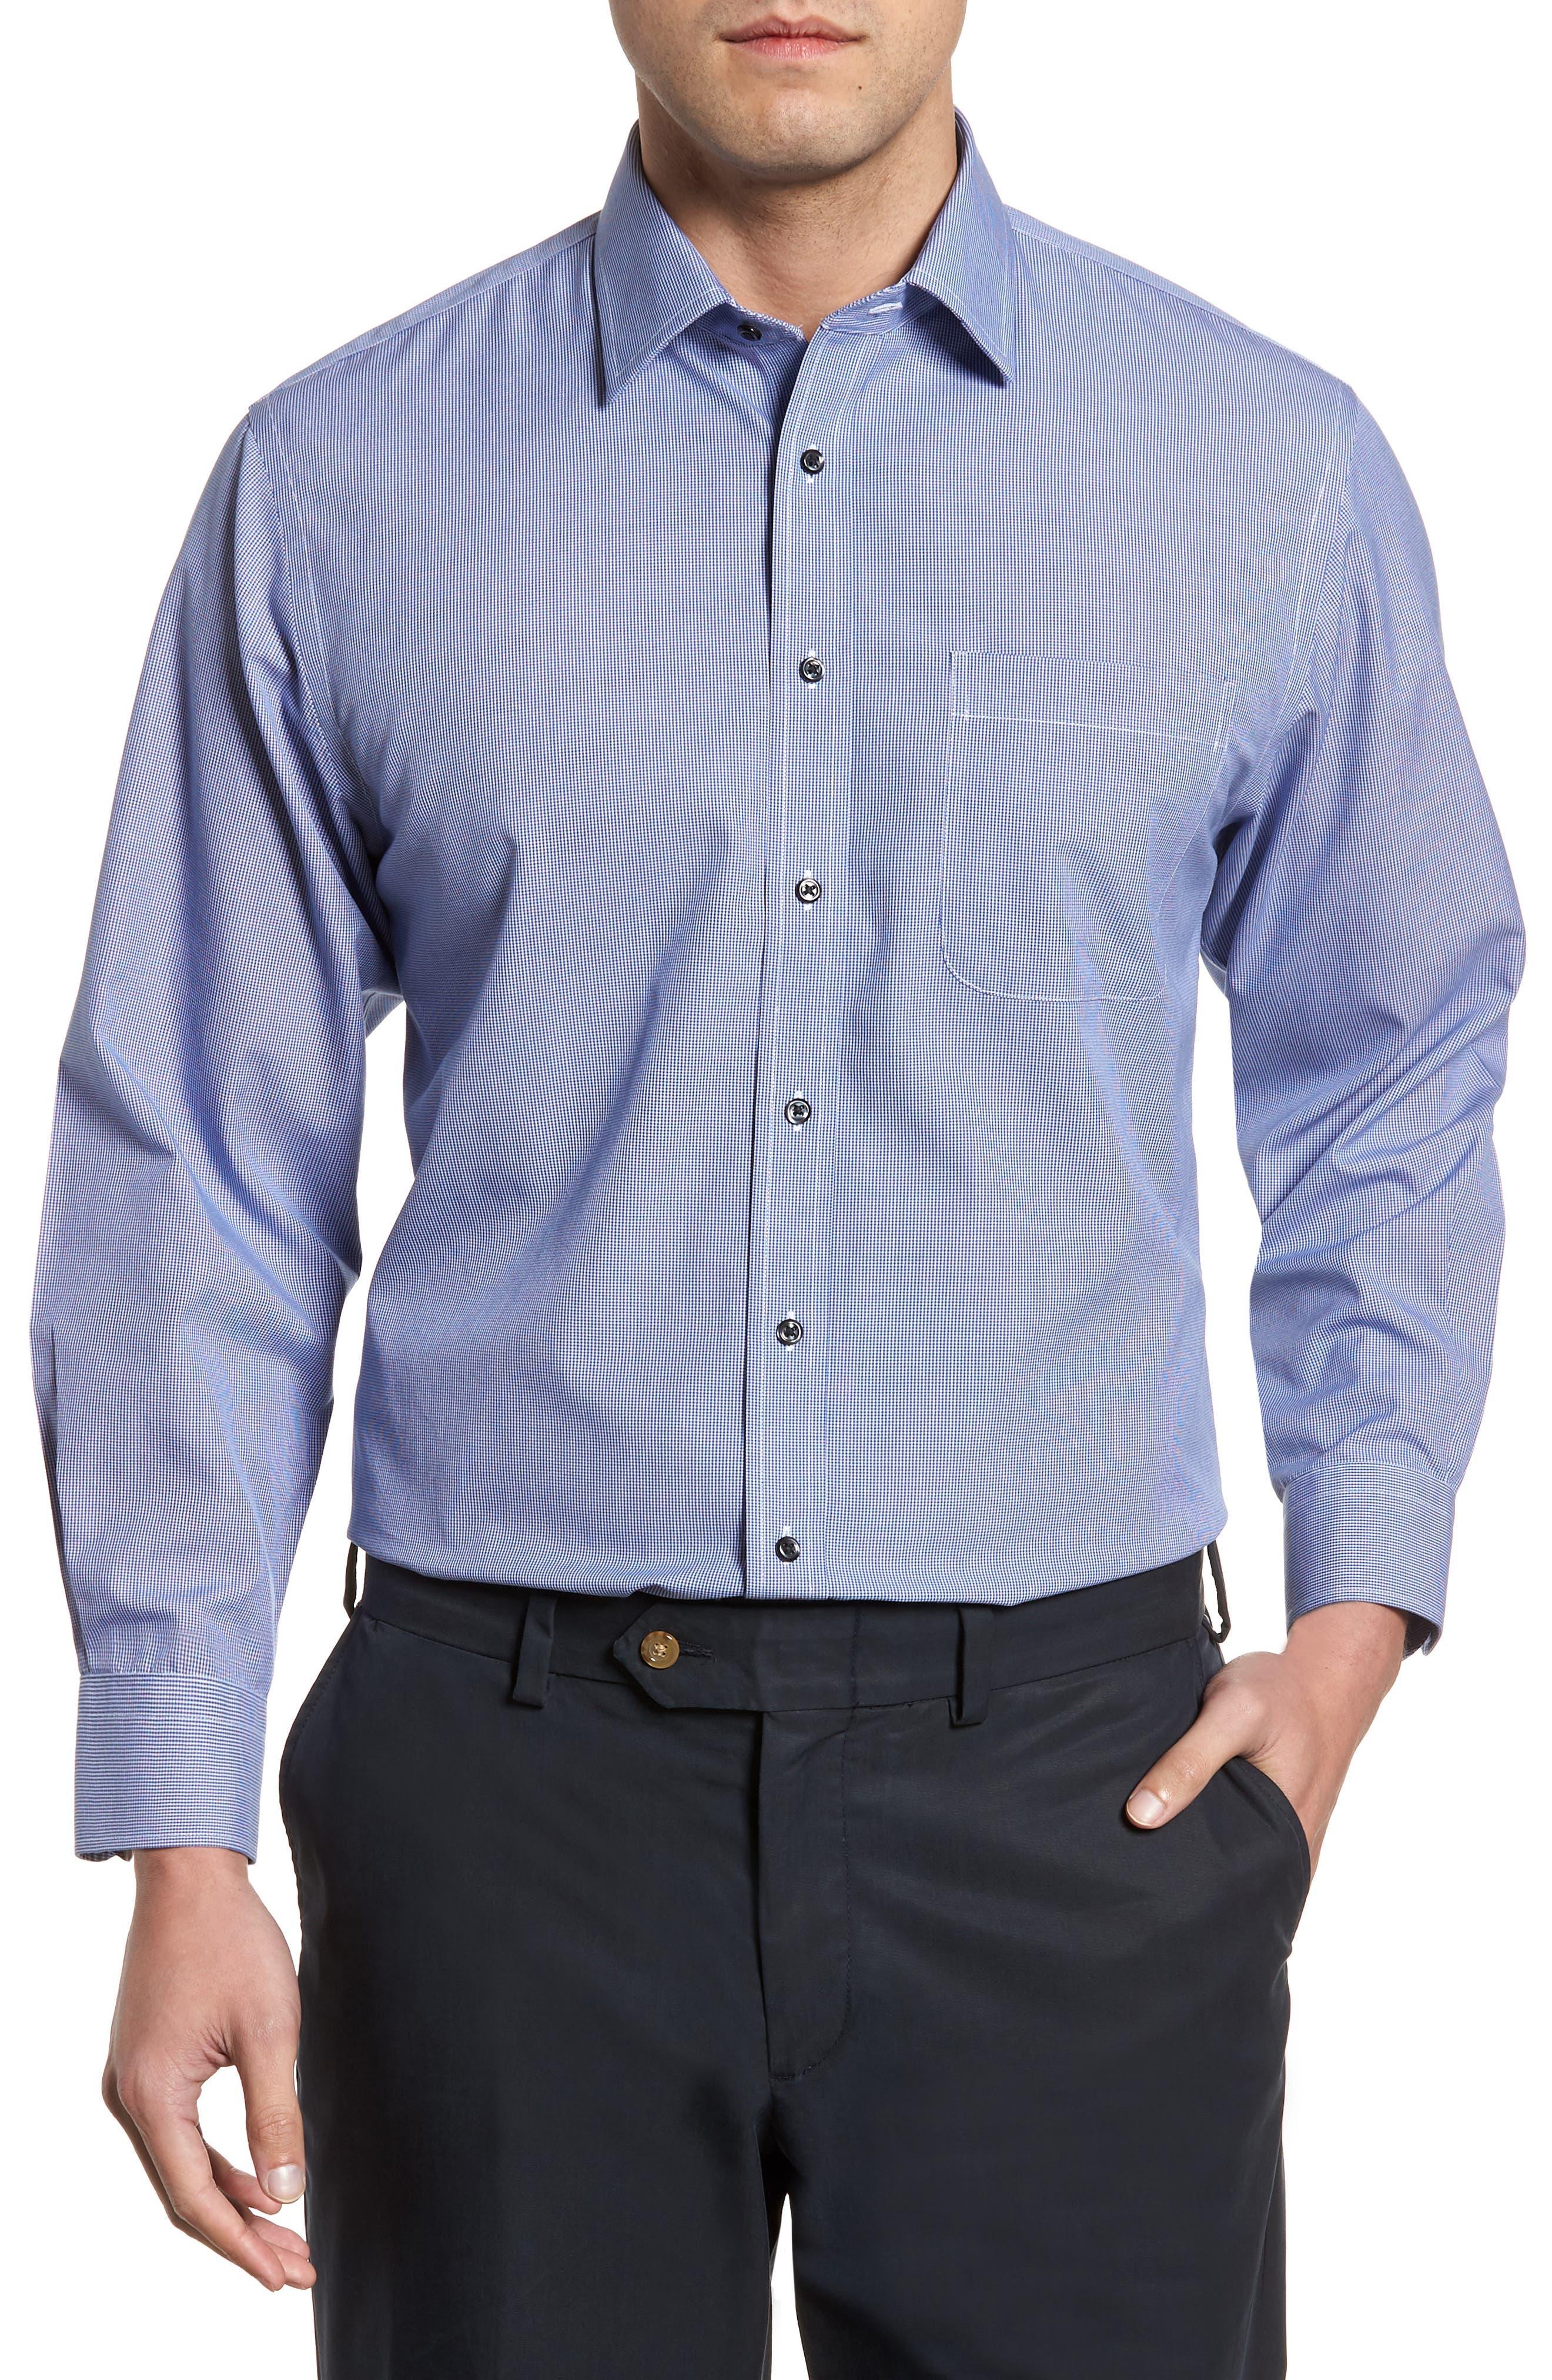 Smartcare<sup>™</sup> Traditional Fit Micro Check Dress Shirt,                             Main thumbnail 1, color,                             Blue Marine